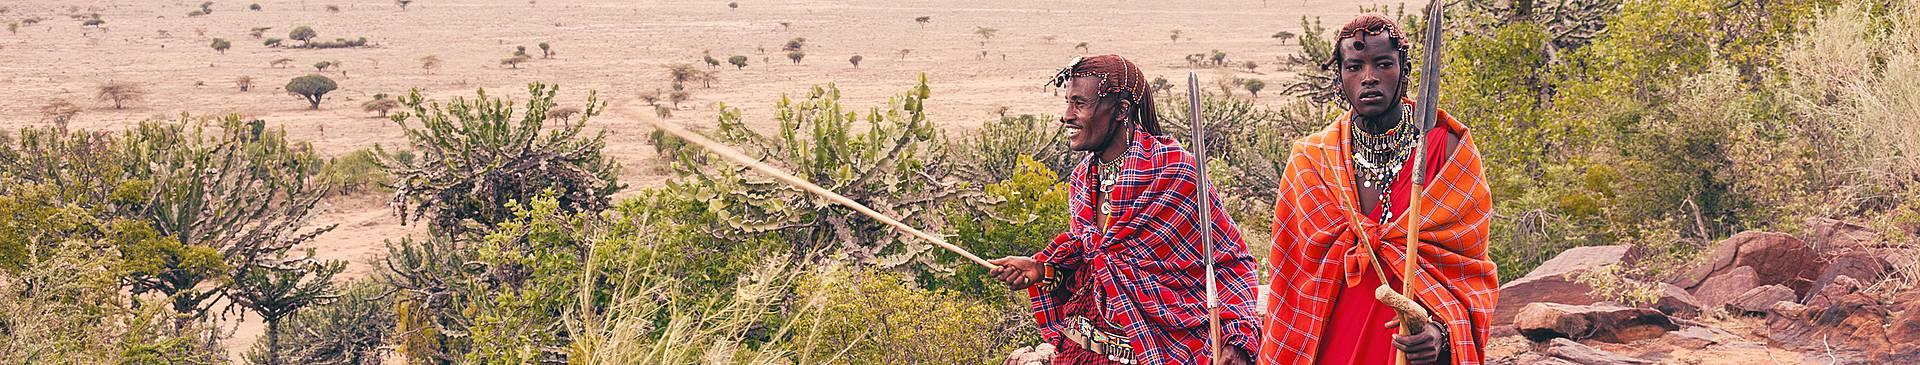 Kenya off-the-beaten-track